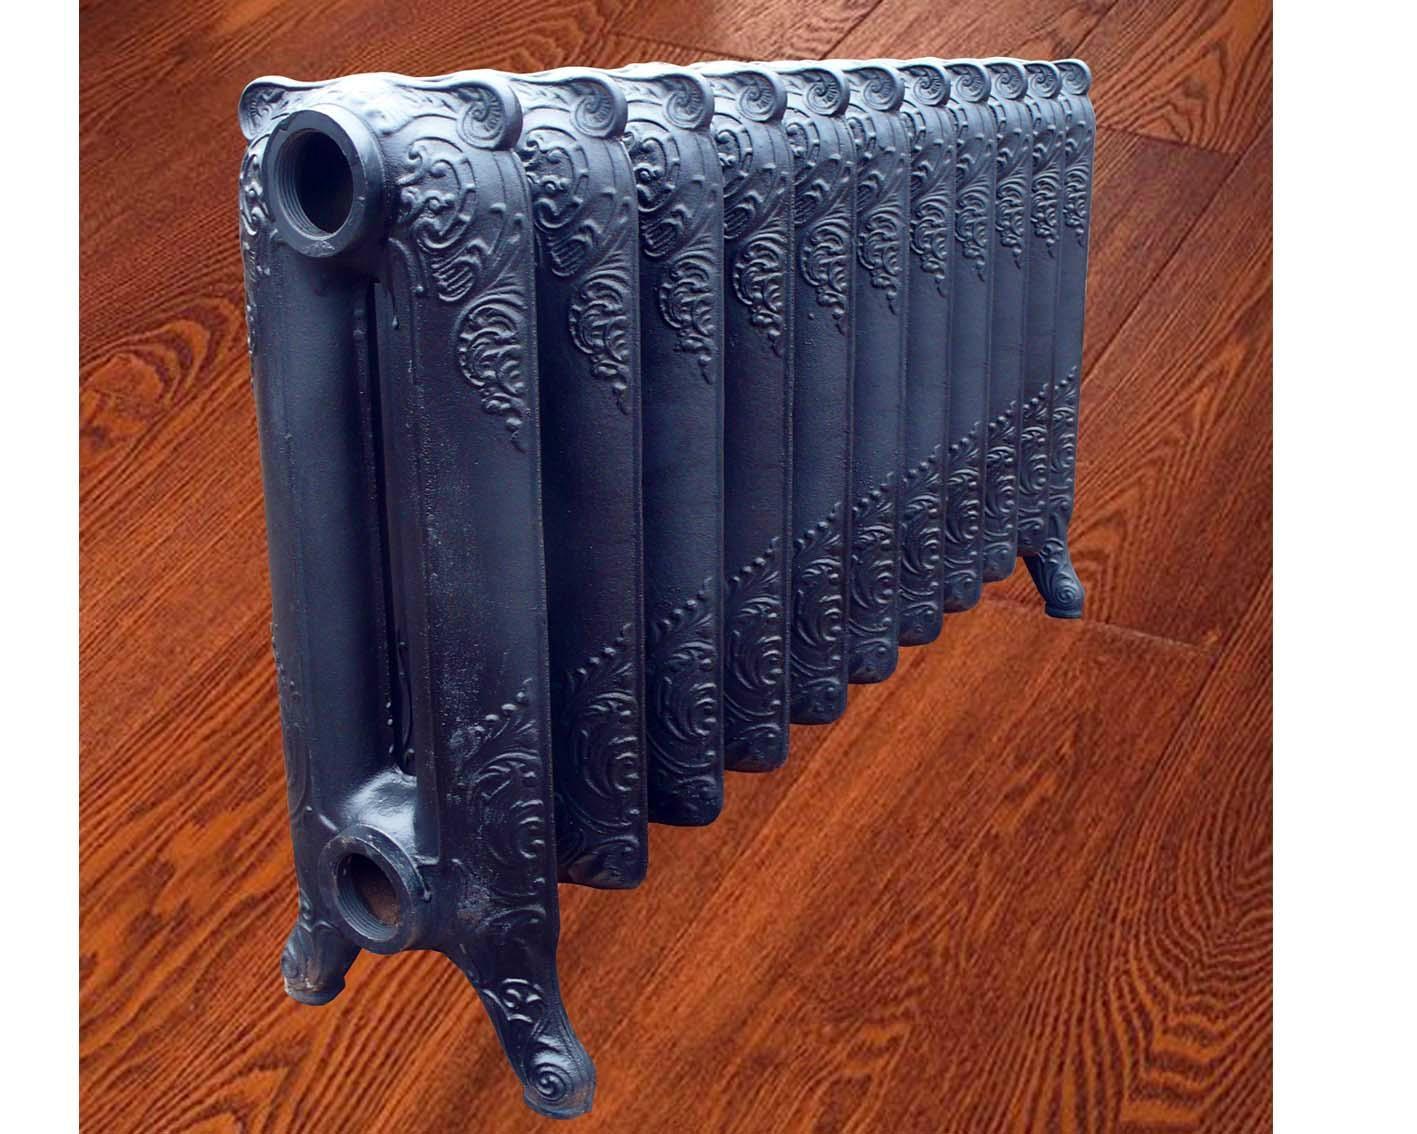 v2-350散熱器